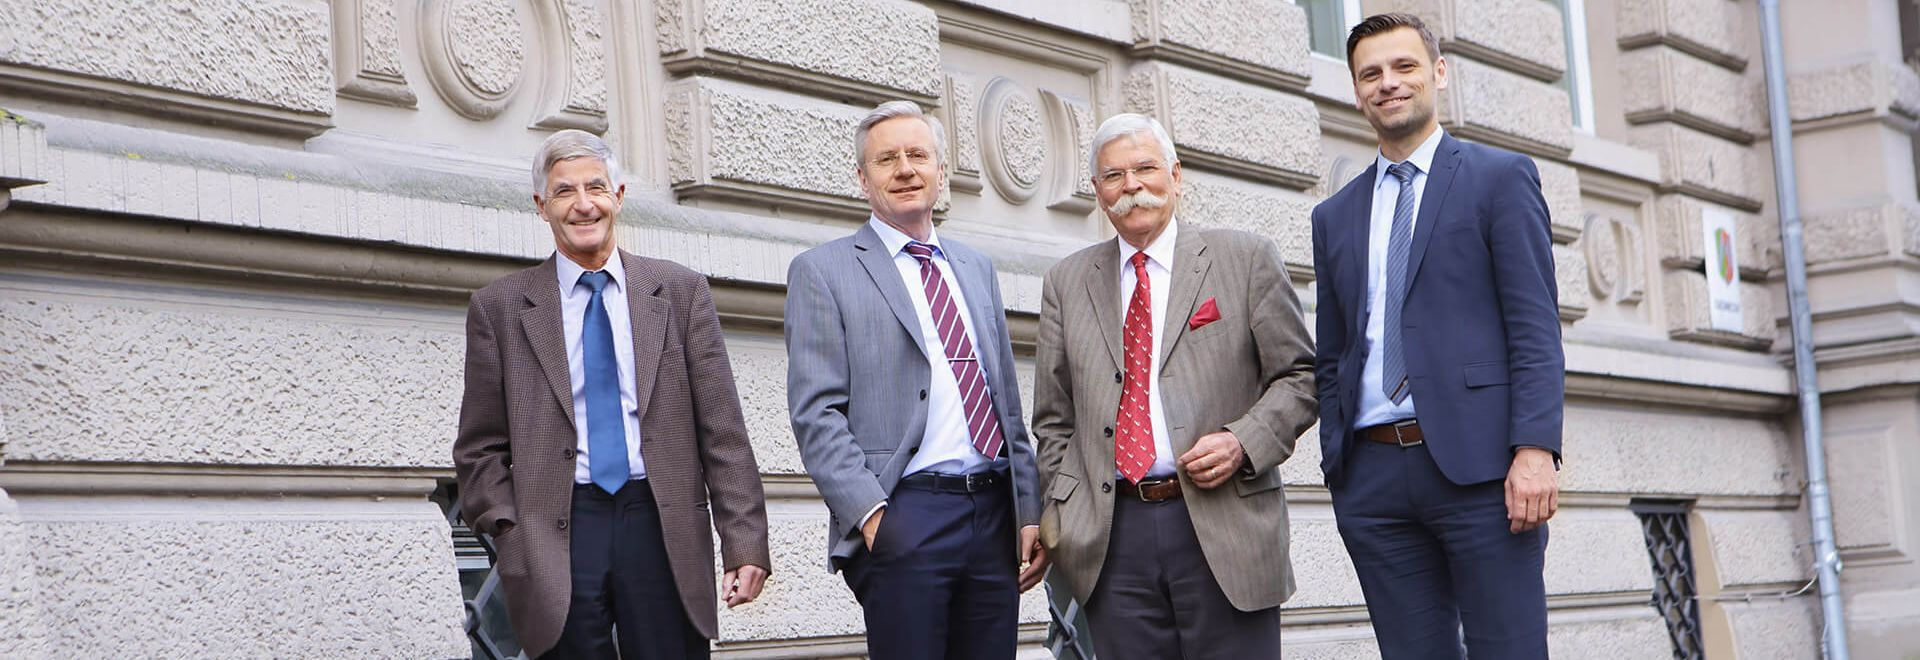 Gruppenbild Metzler, Jäger, Dorn, Kemper